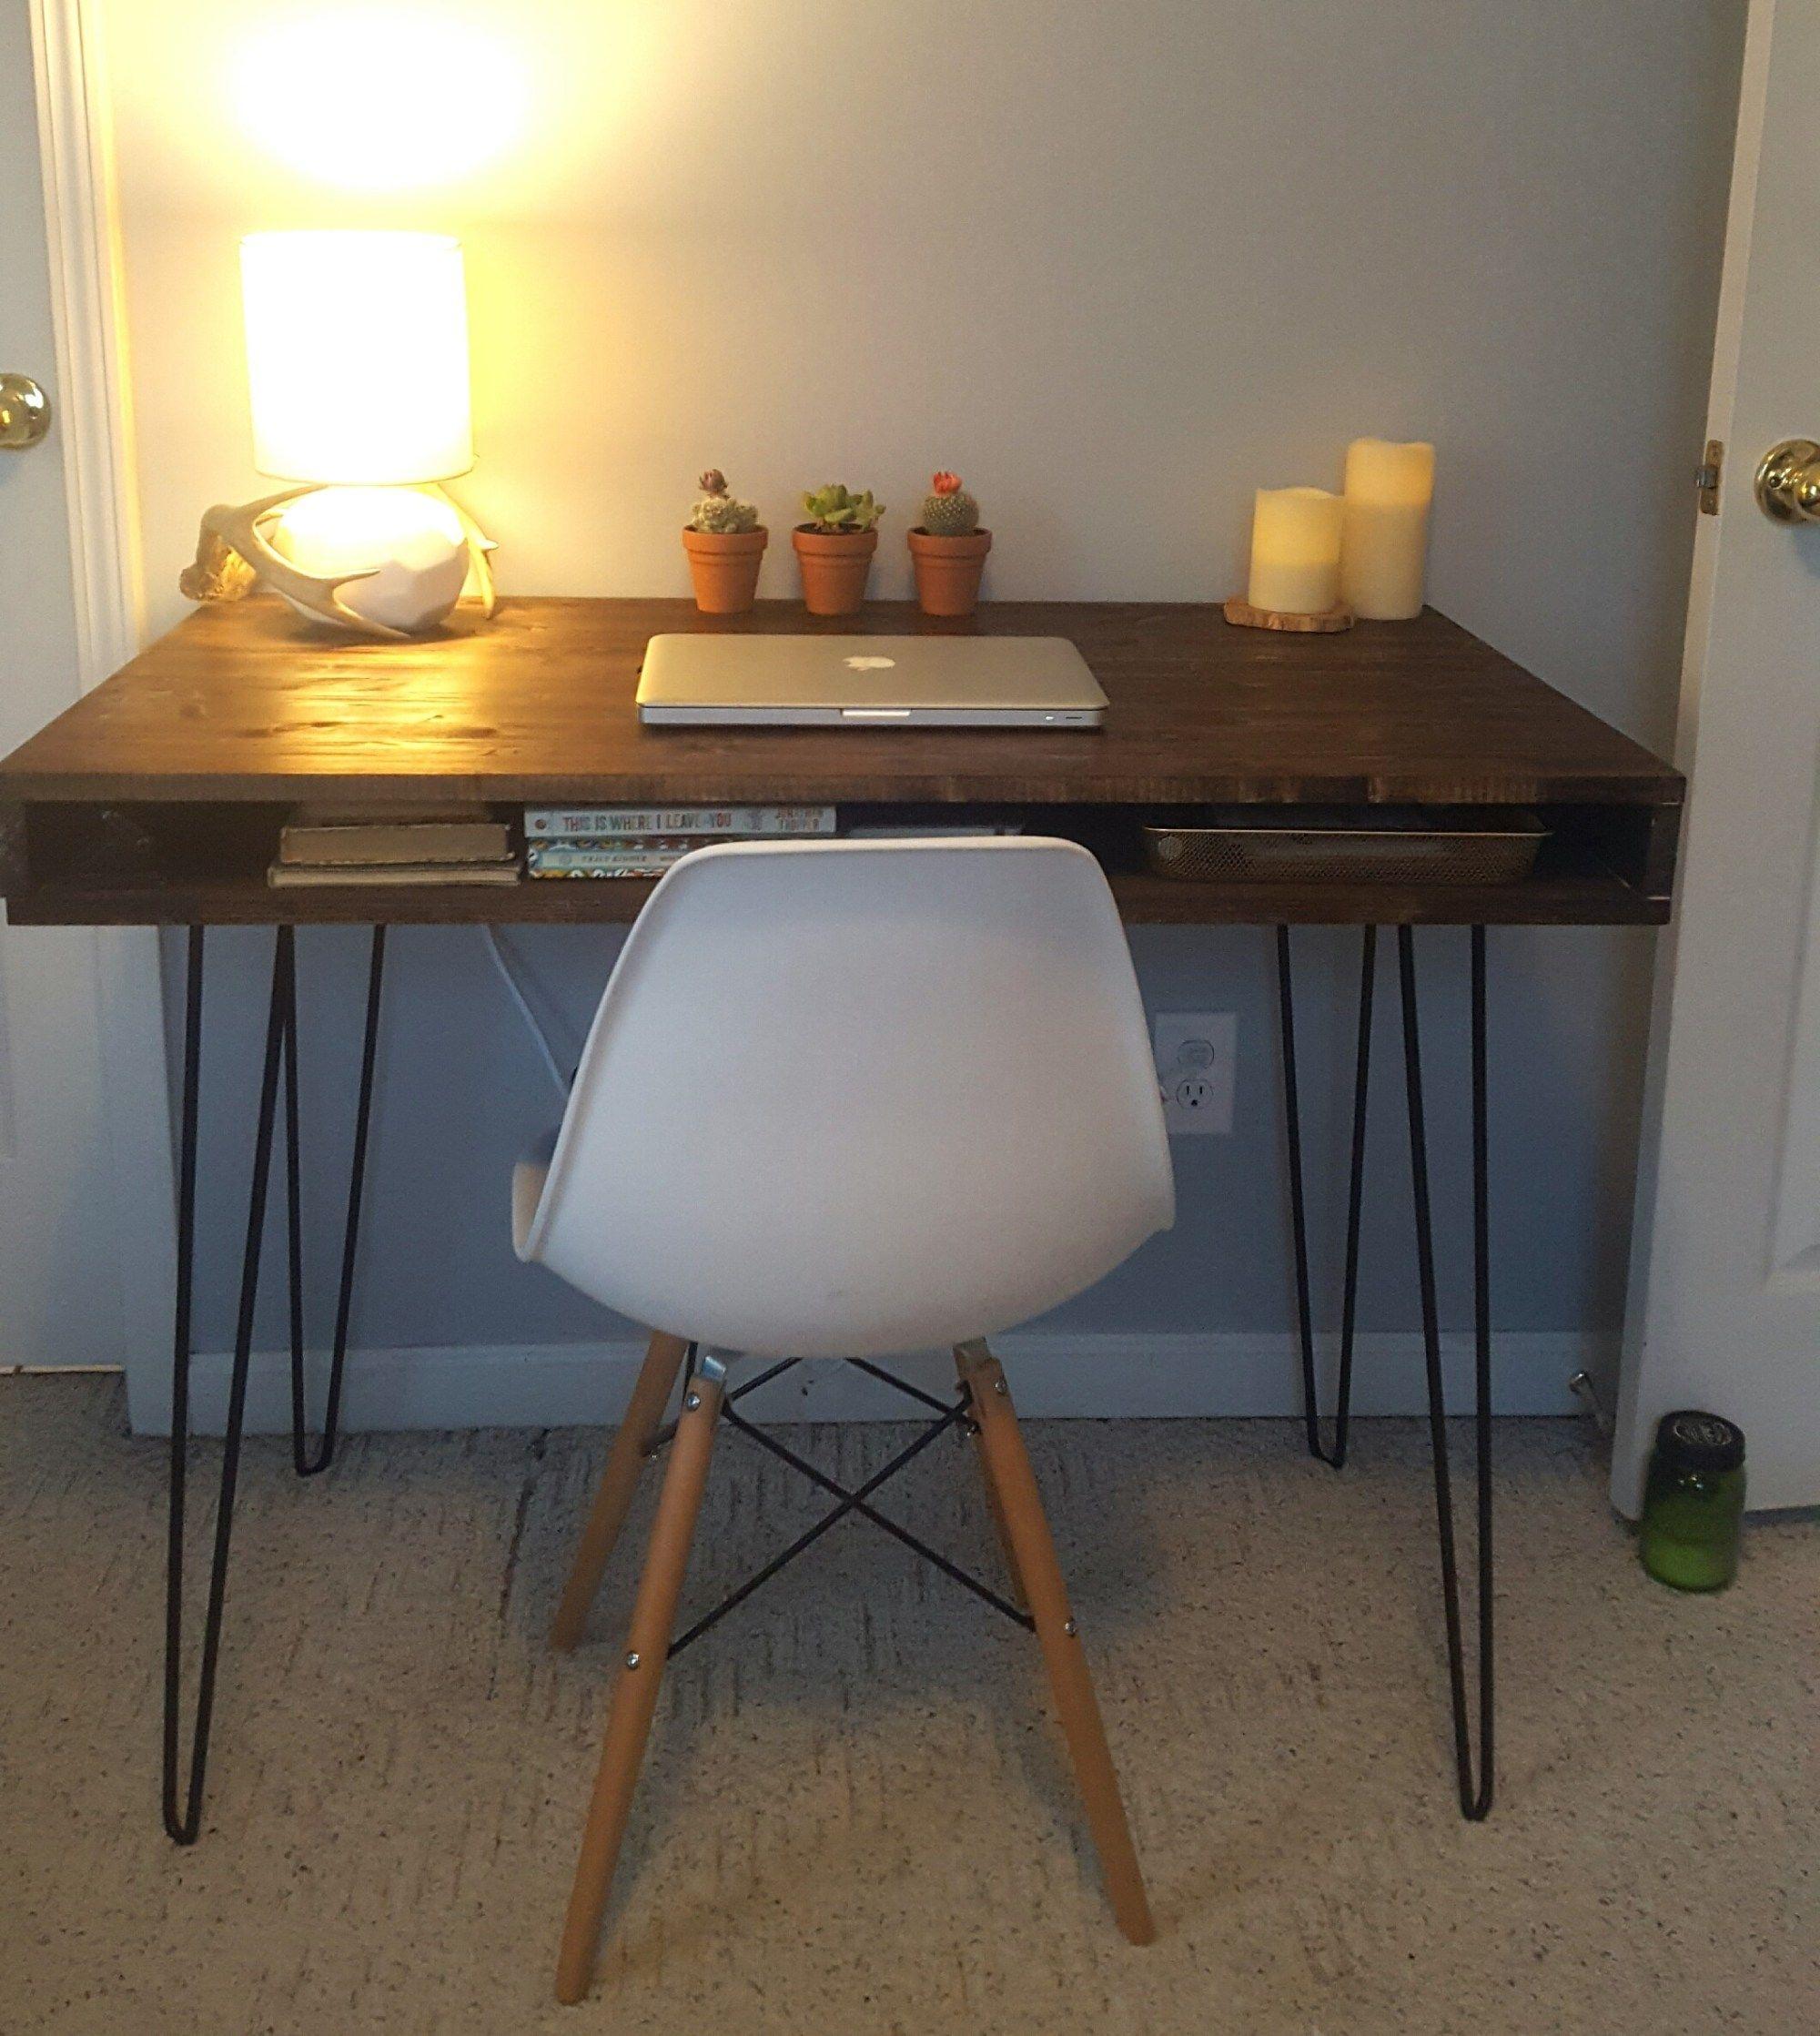 Mid Century Modern Desk Built By Reader Using Remodelaholic Plans Mid Century Modern Desk Mid Century Desk Modern Desk